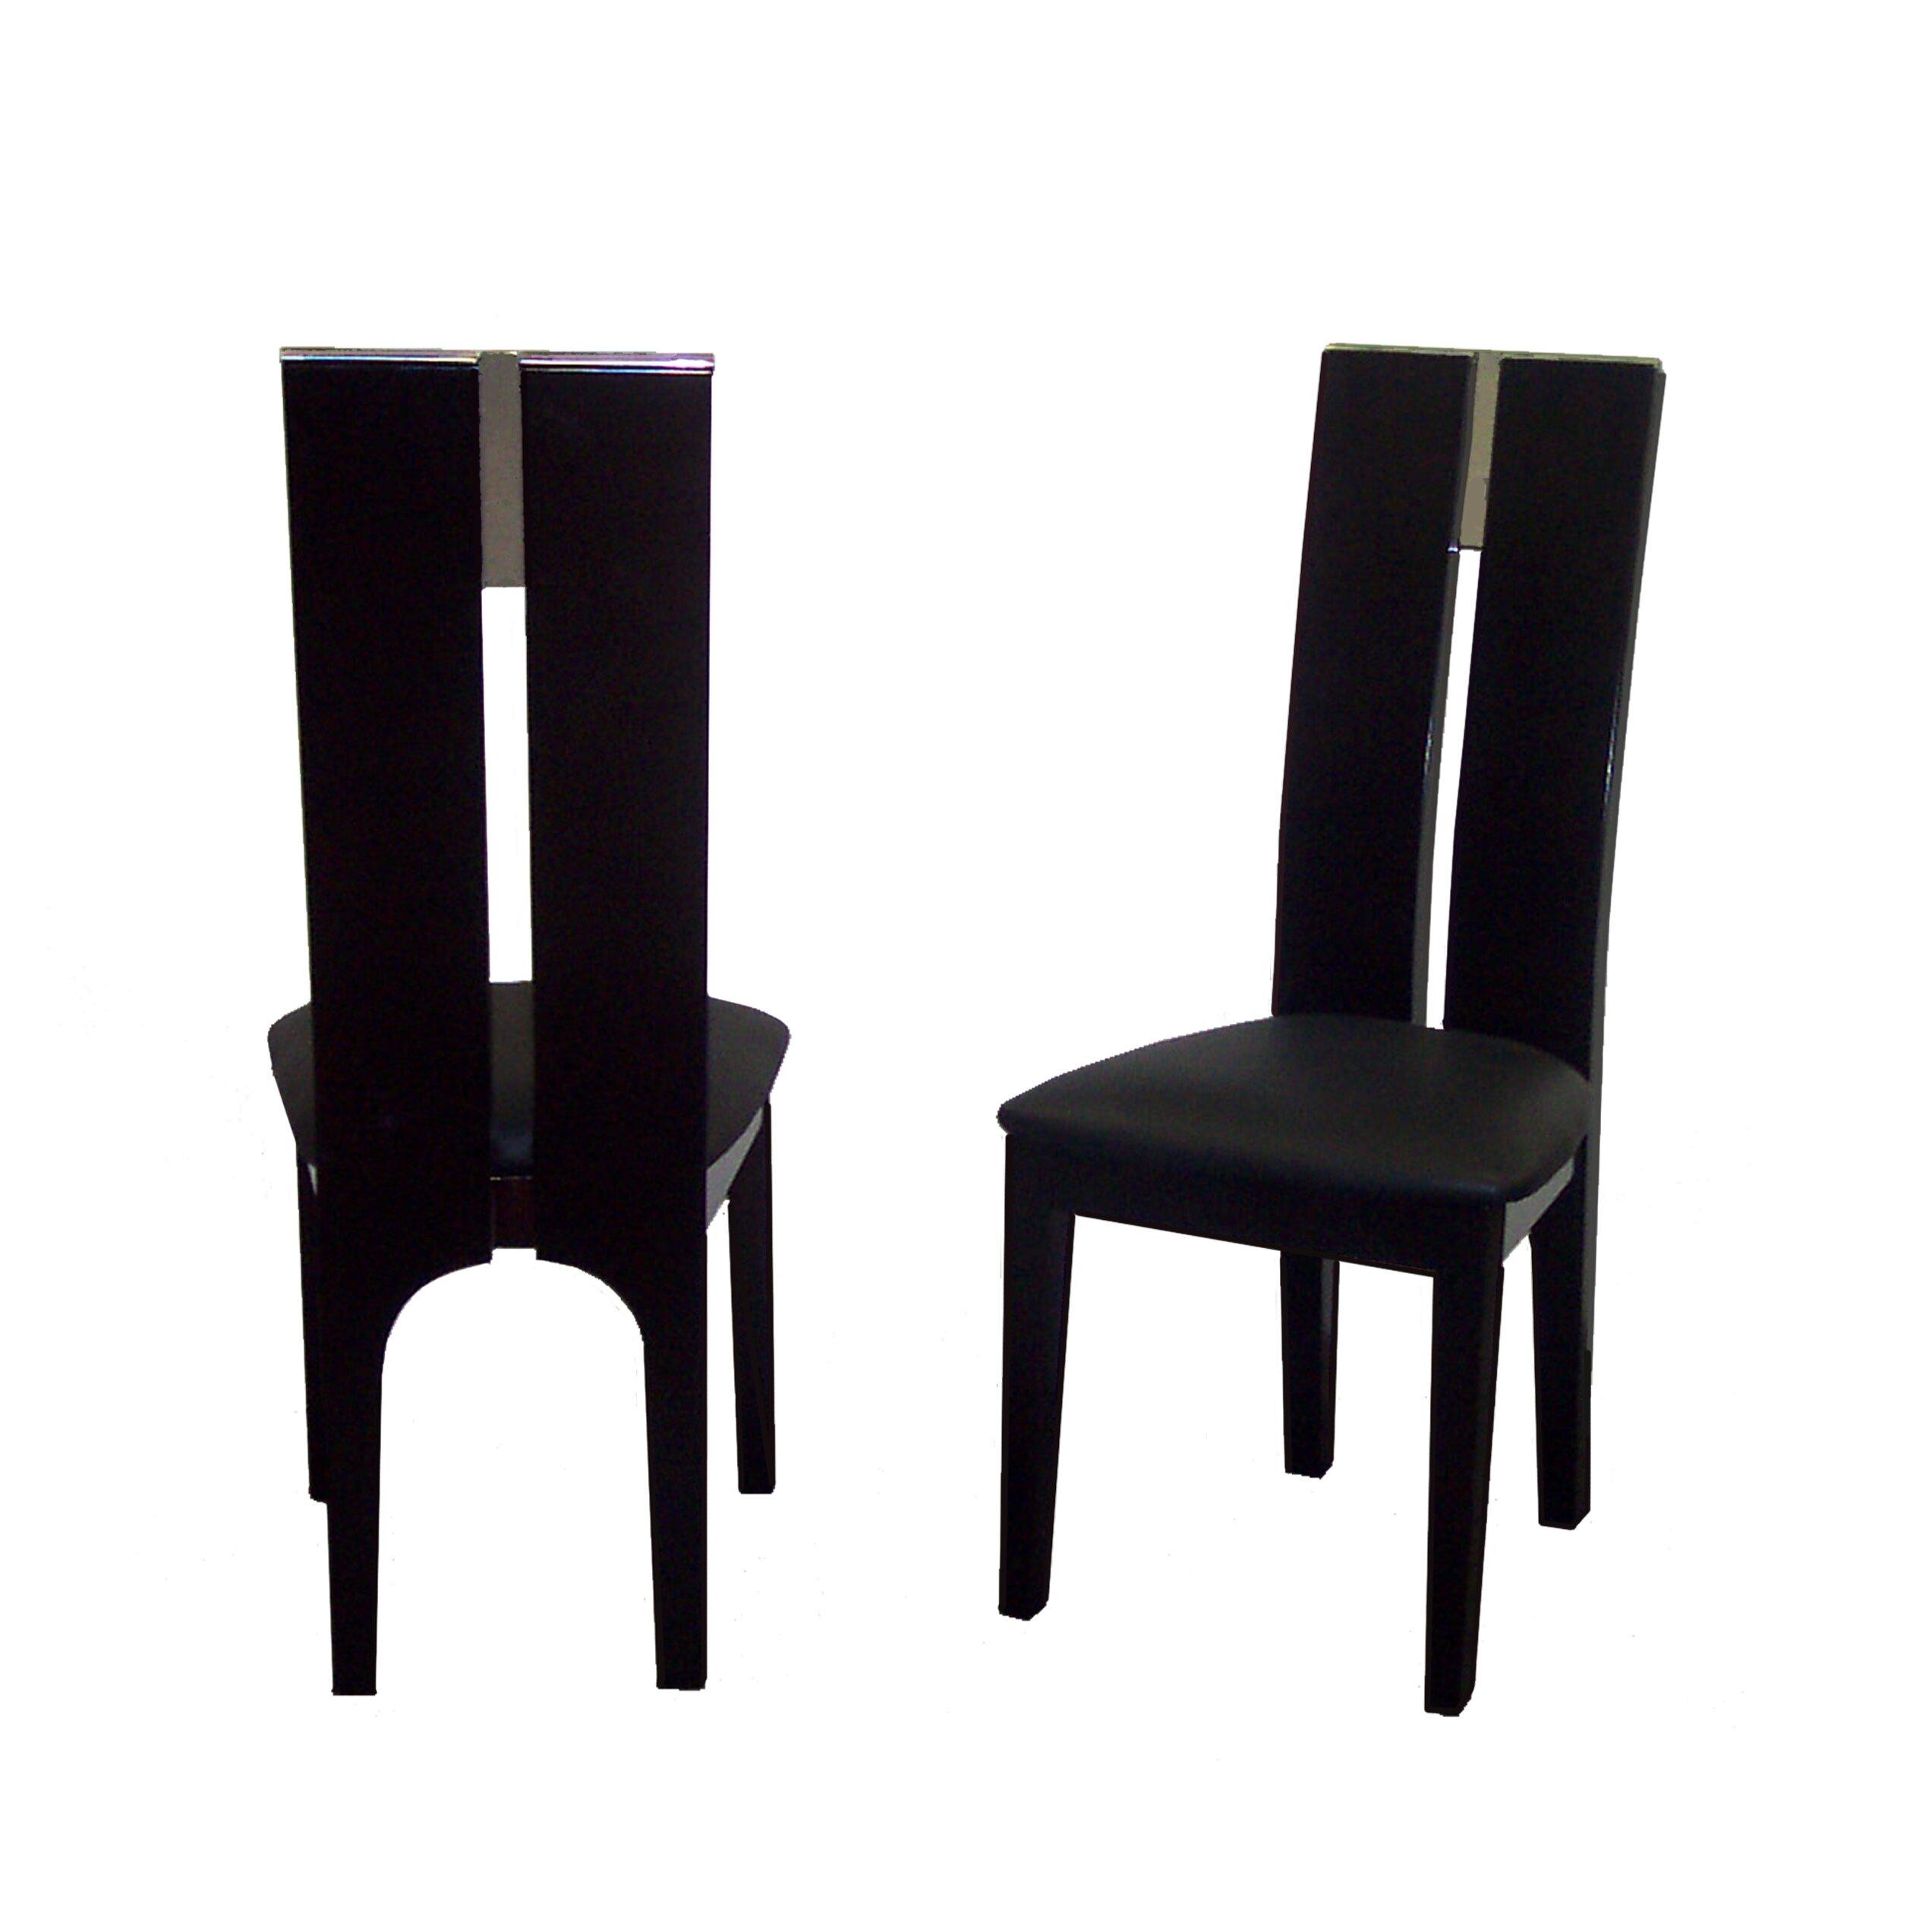 sharelle dining table -  sharelle furnishings avanti side chair